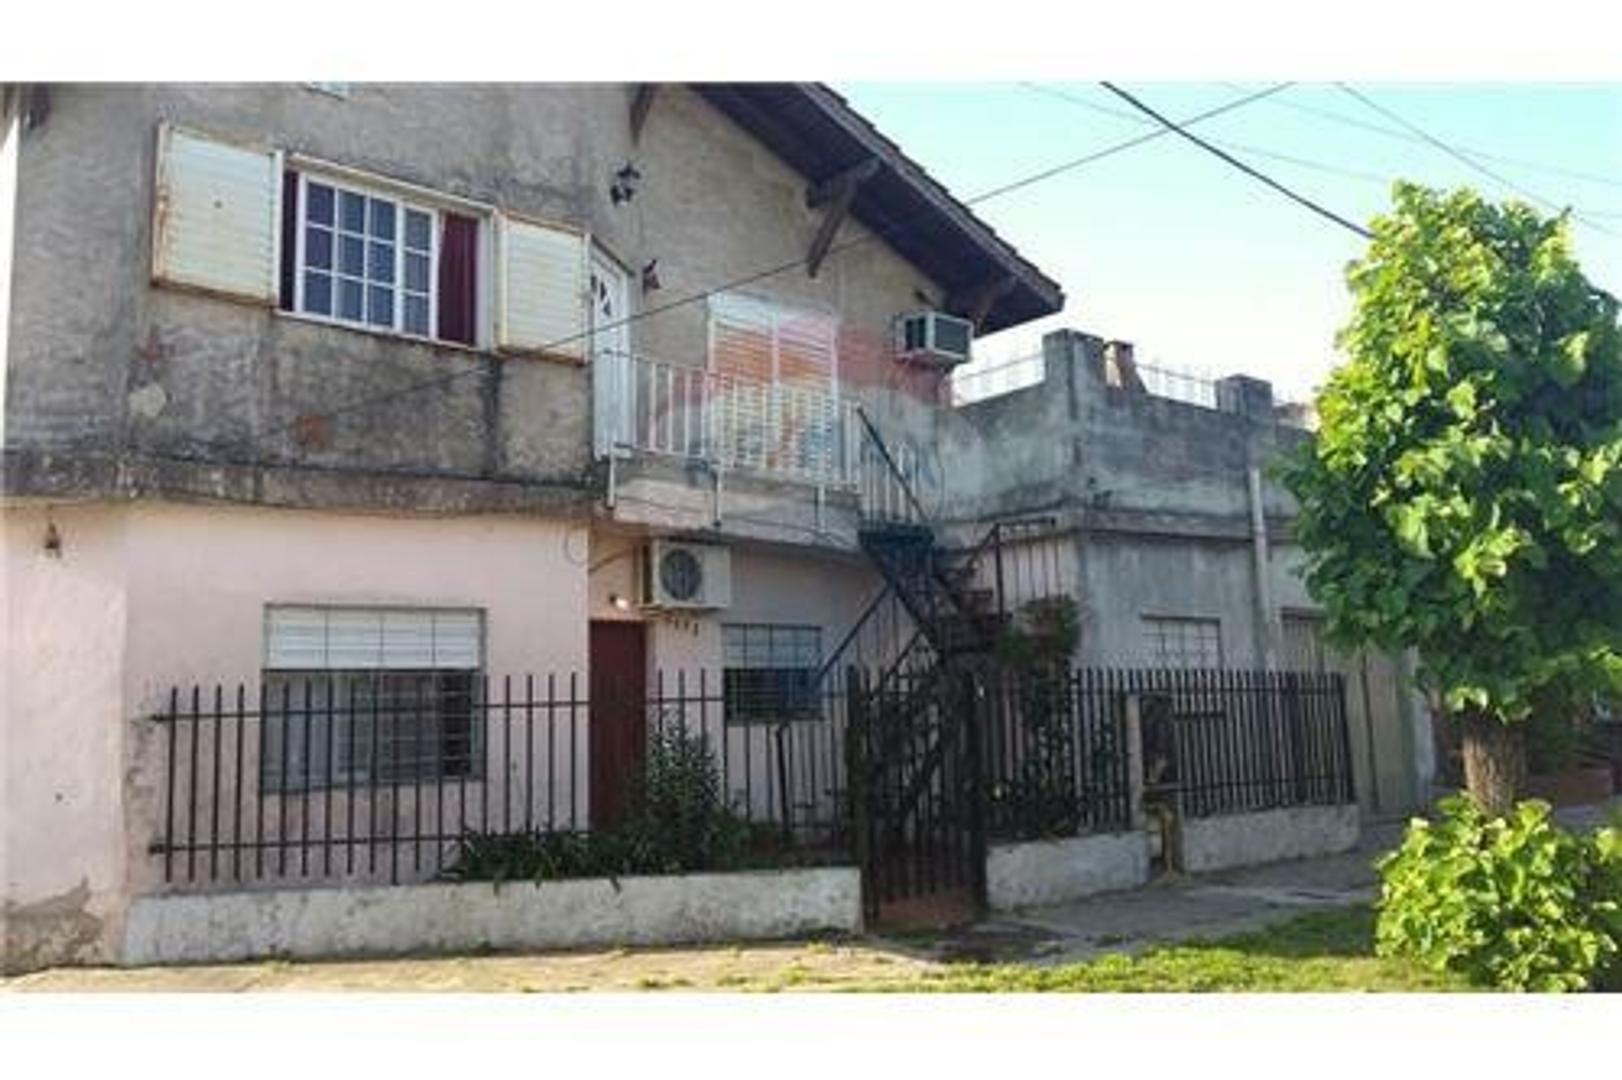 Casa en Lote Propio |Dos Cocheras|Patio|Terraza